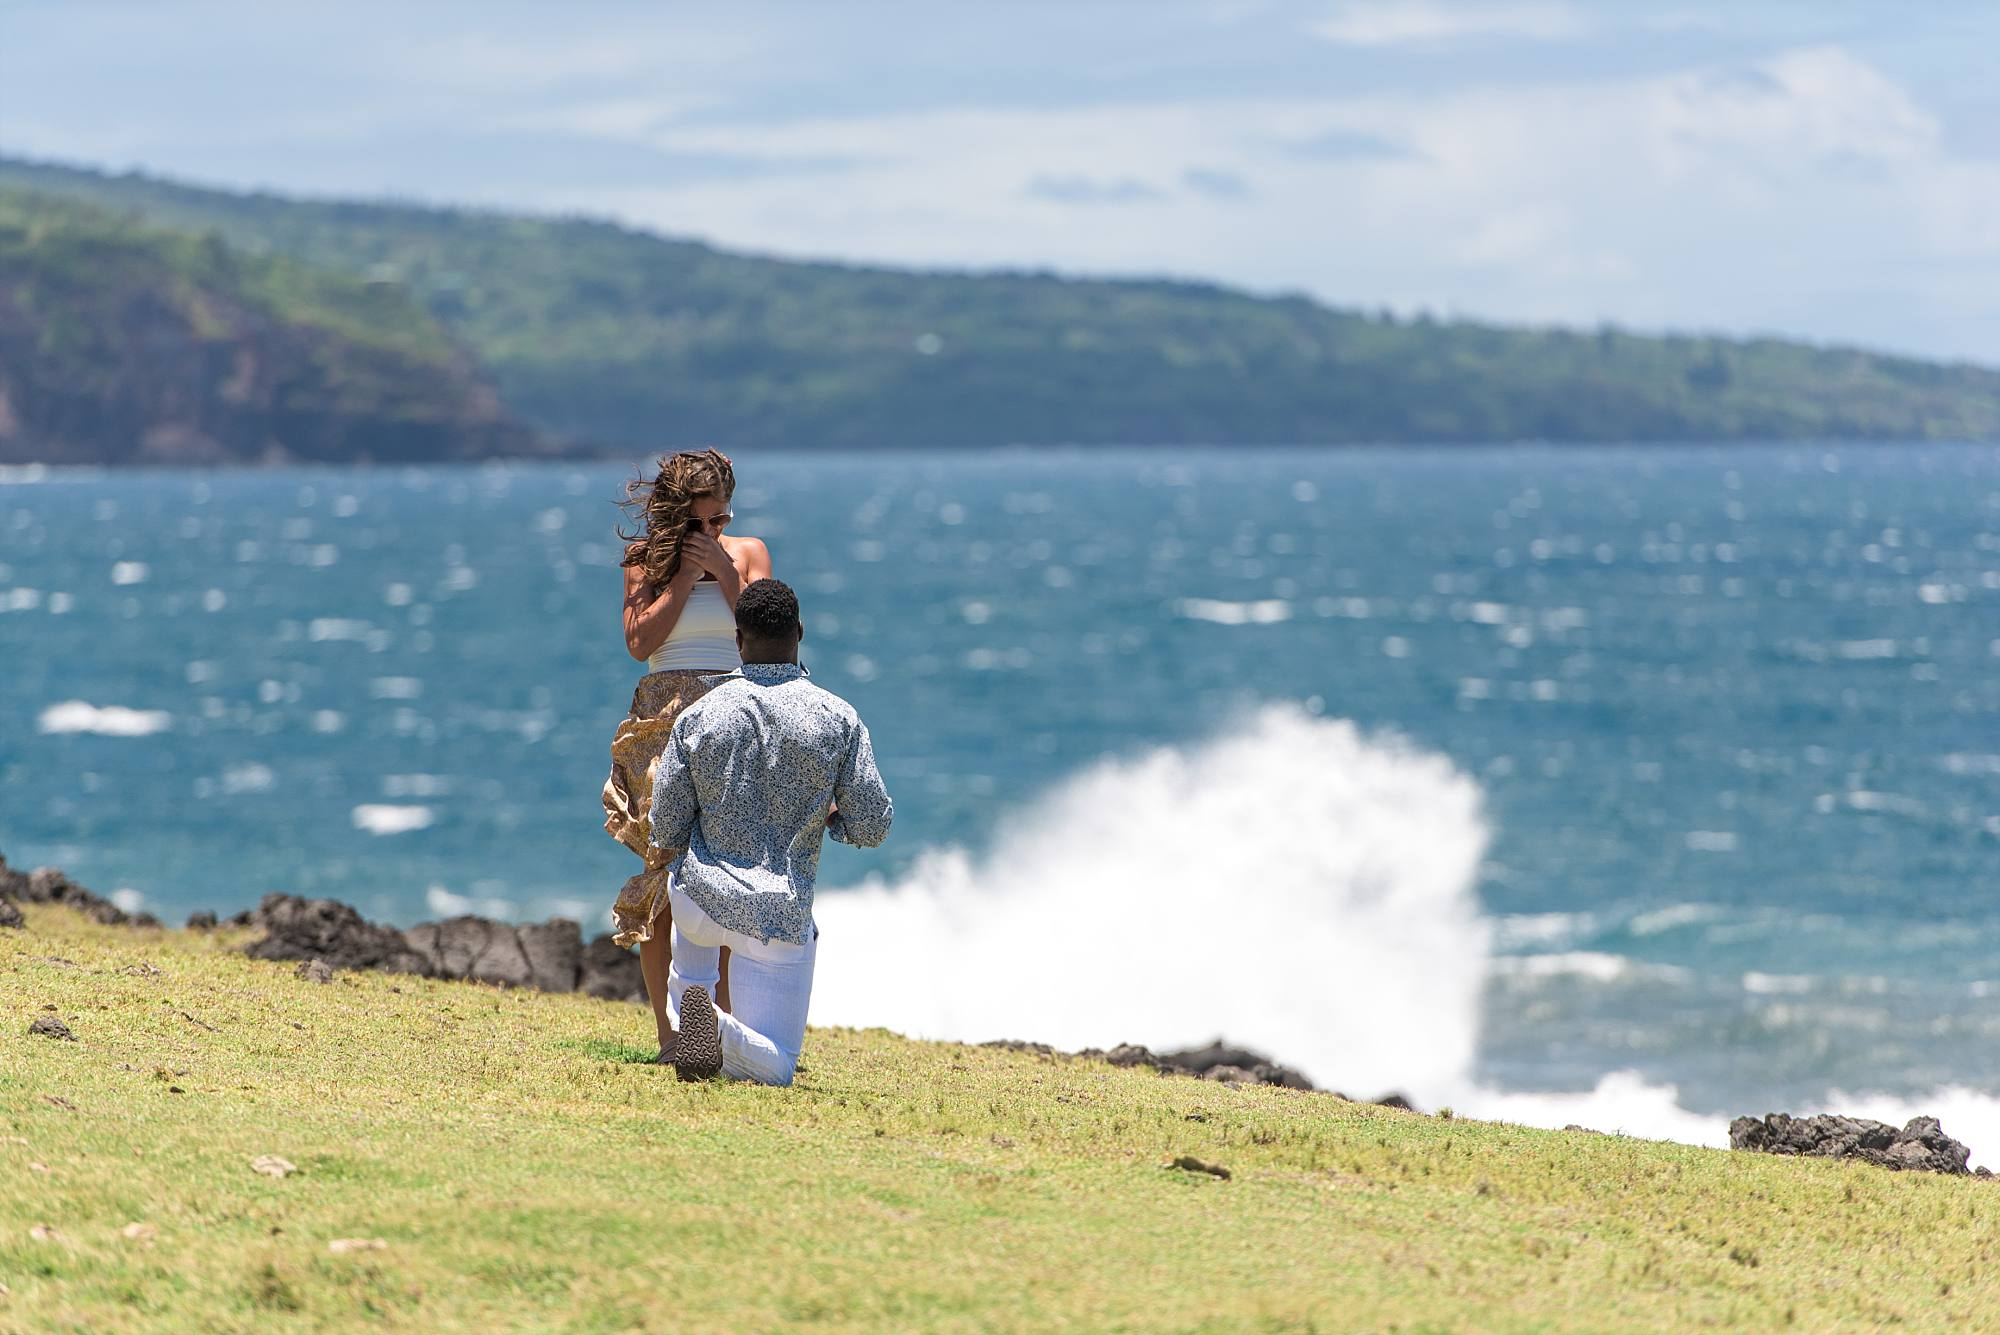 Brandin Cooks proposing to his girlfriend on Maui's coastline